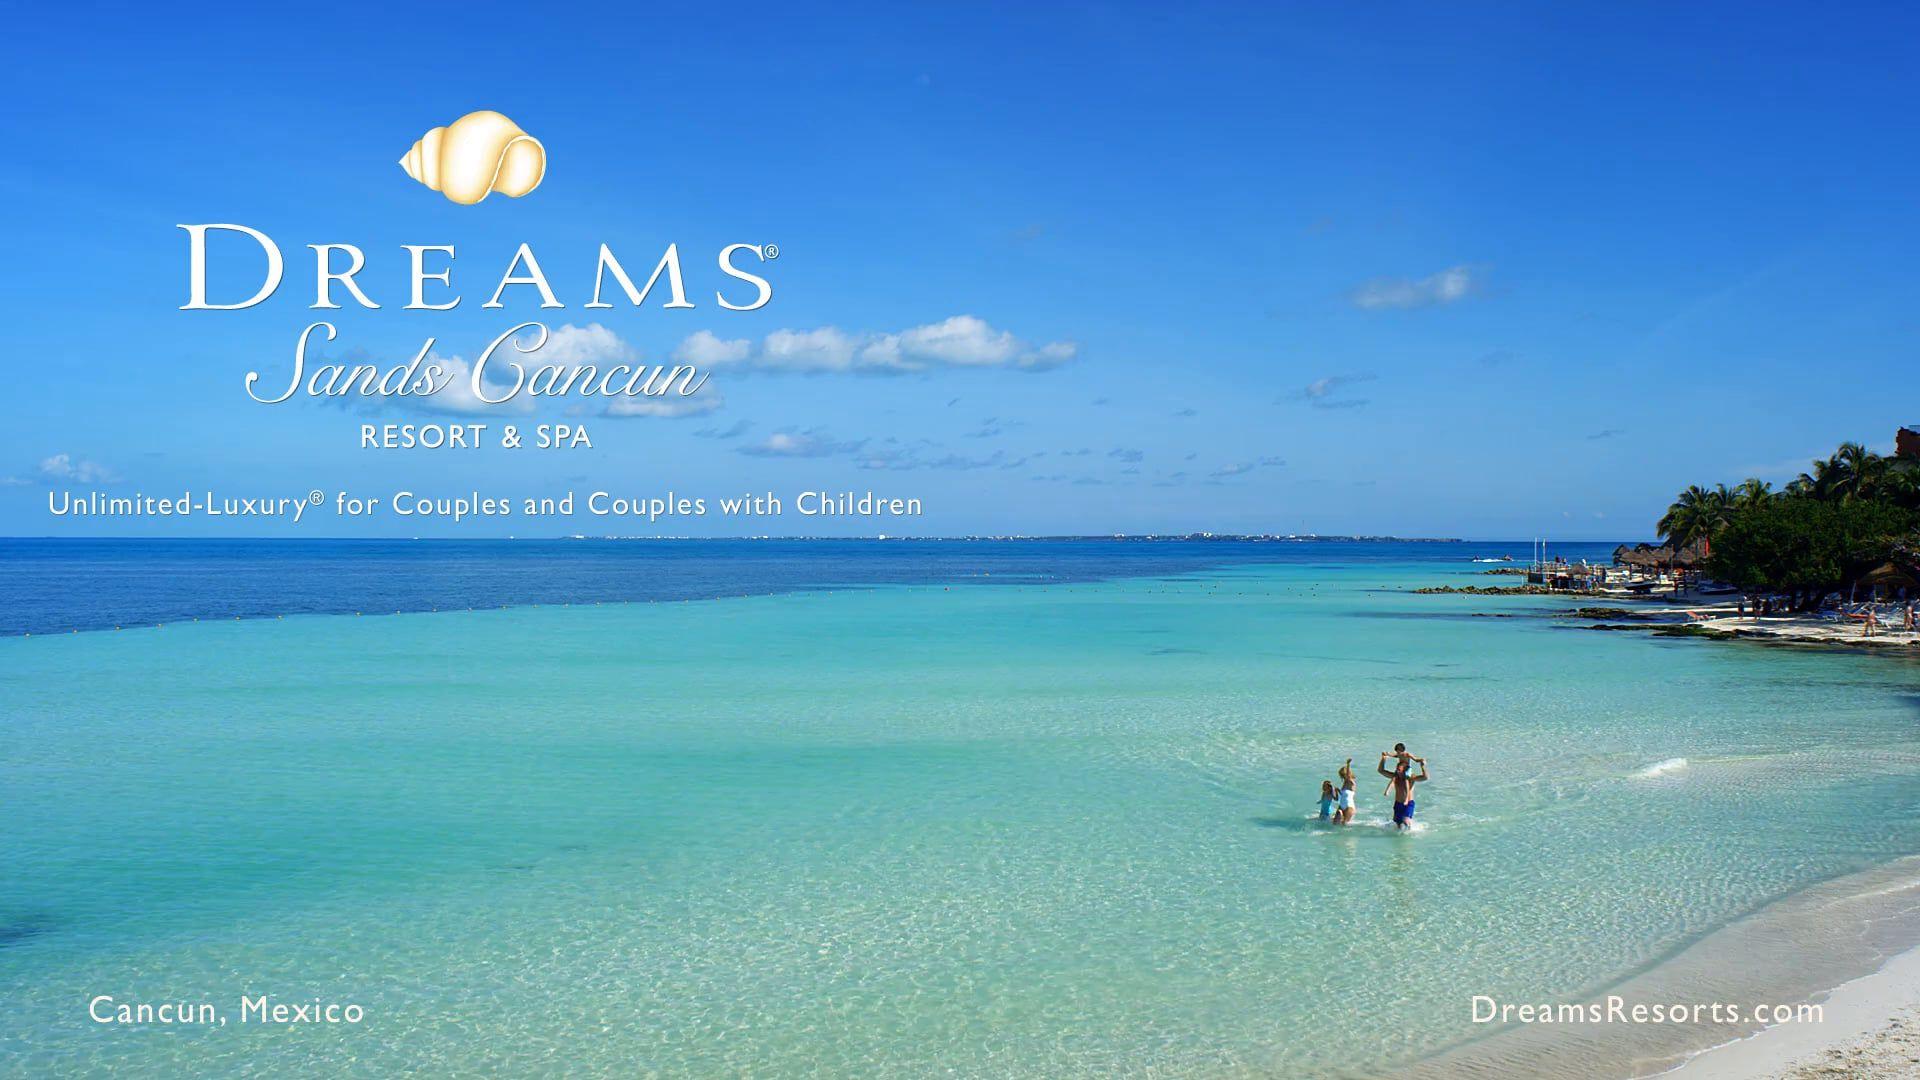 Resort Commercial Cancun Resorts Cancun Photos Resort